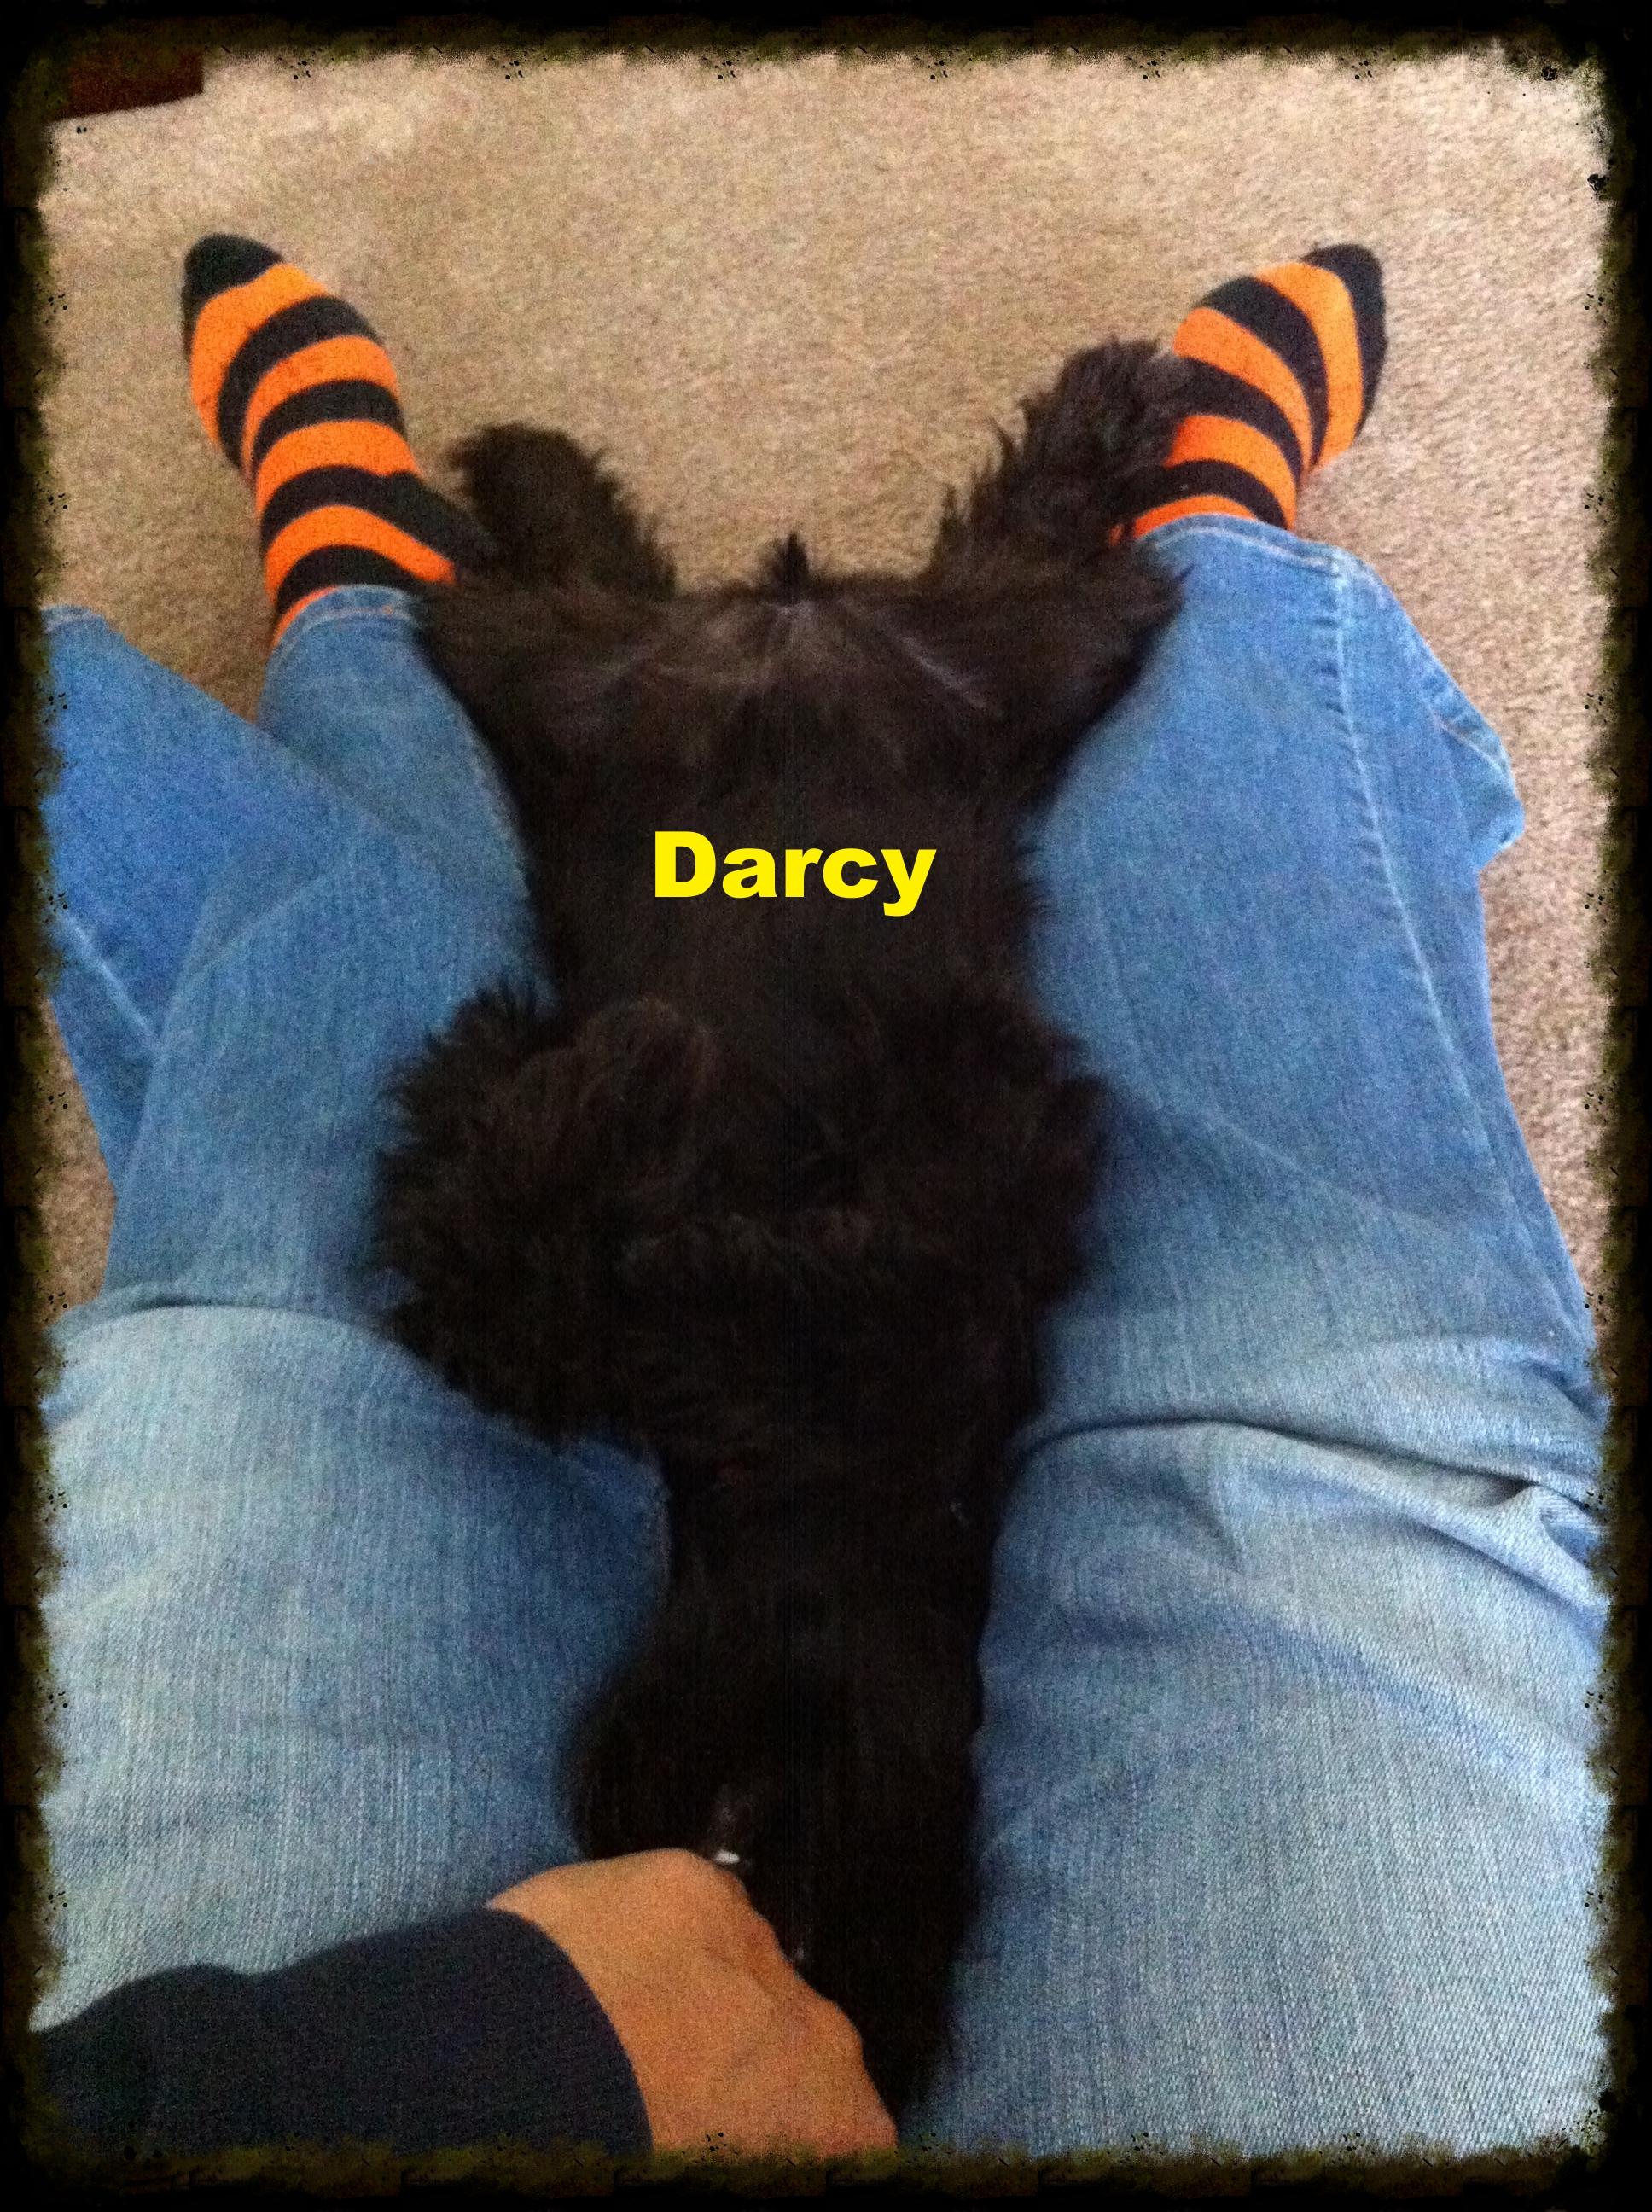 Upside down Darcy resting between my legs!